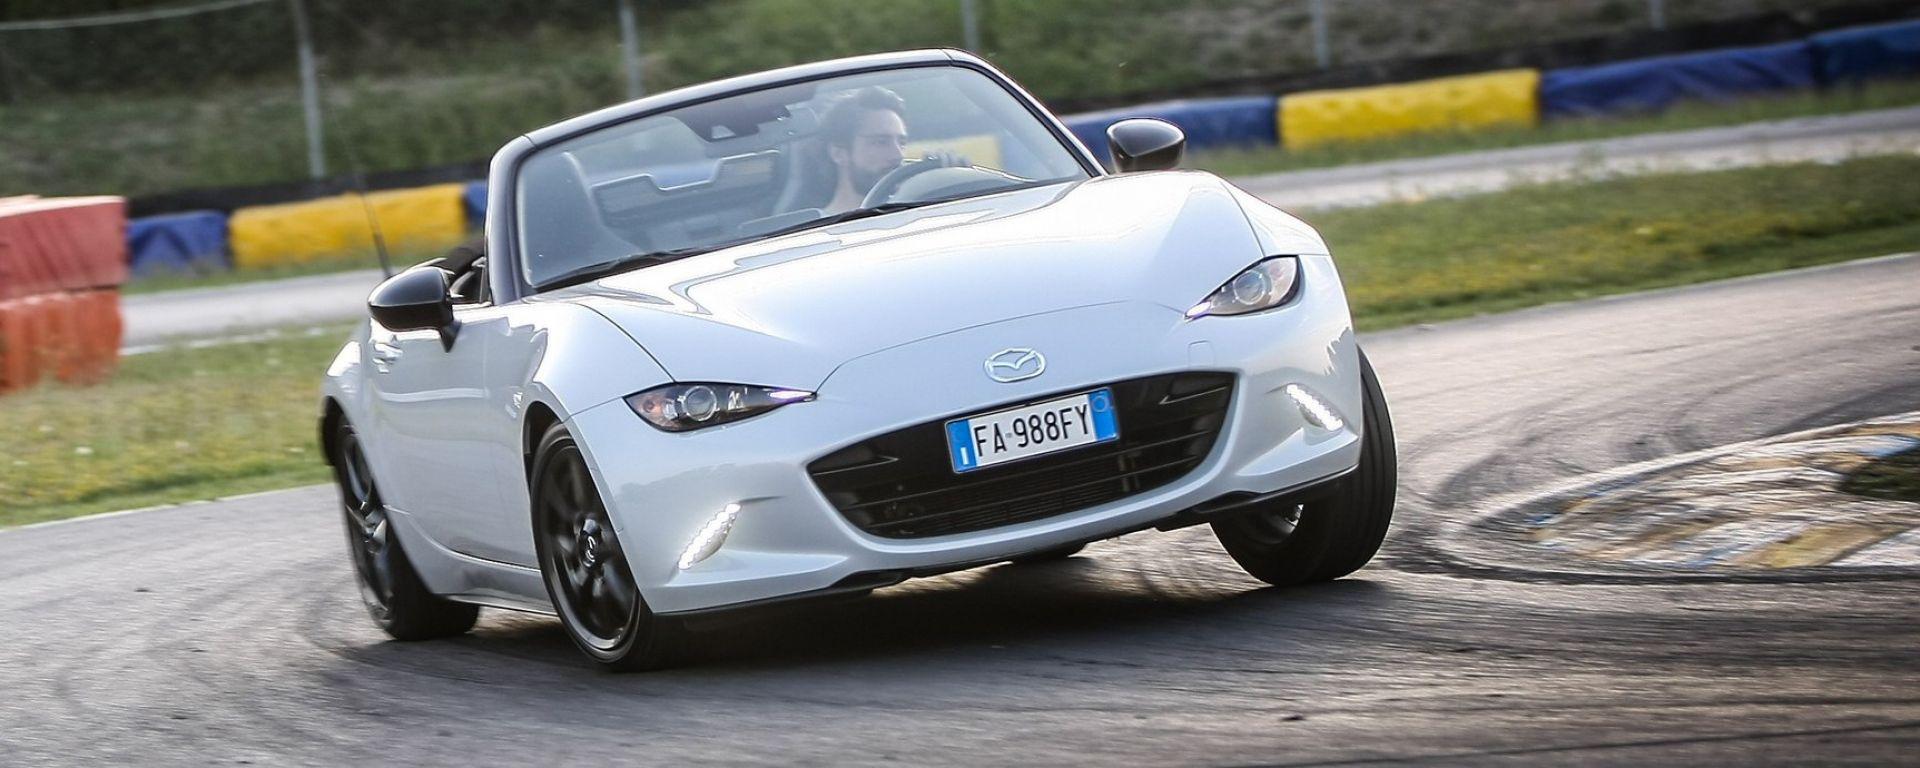 Mazda MX-5: ecco perché si guida così bene | Cool Factor